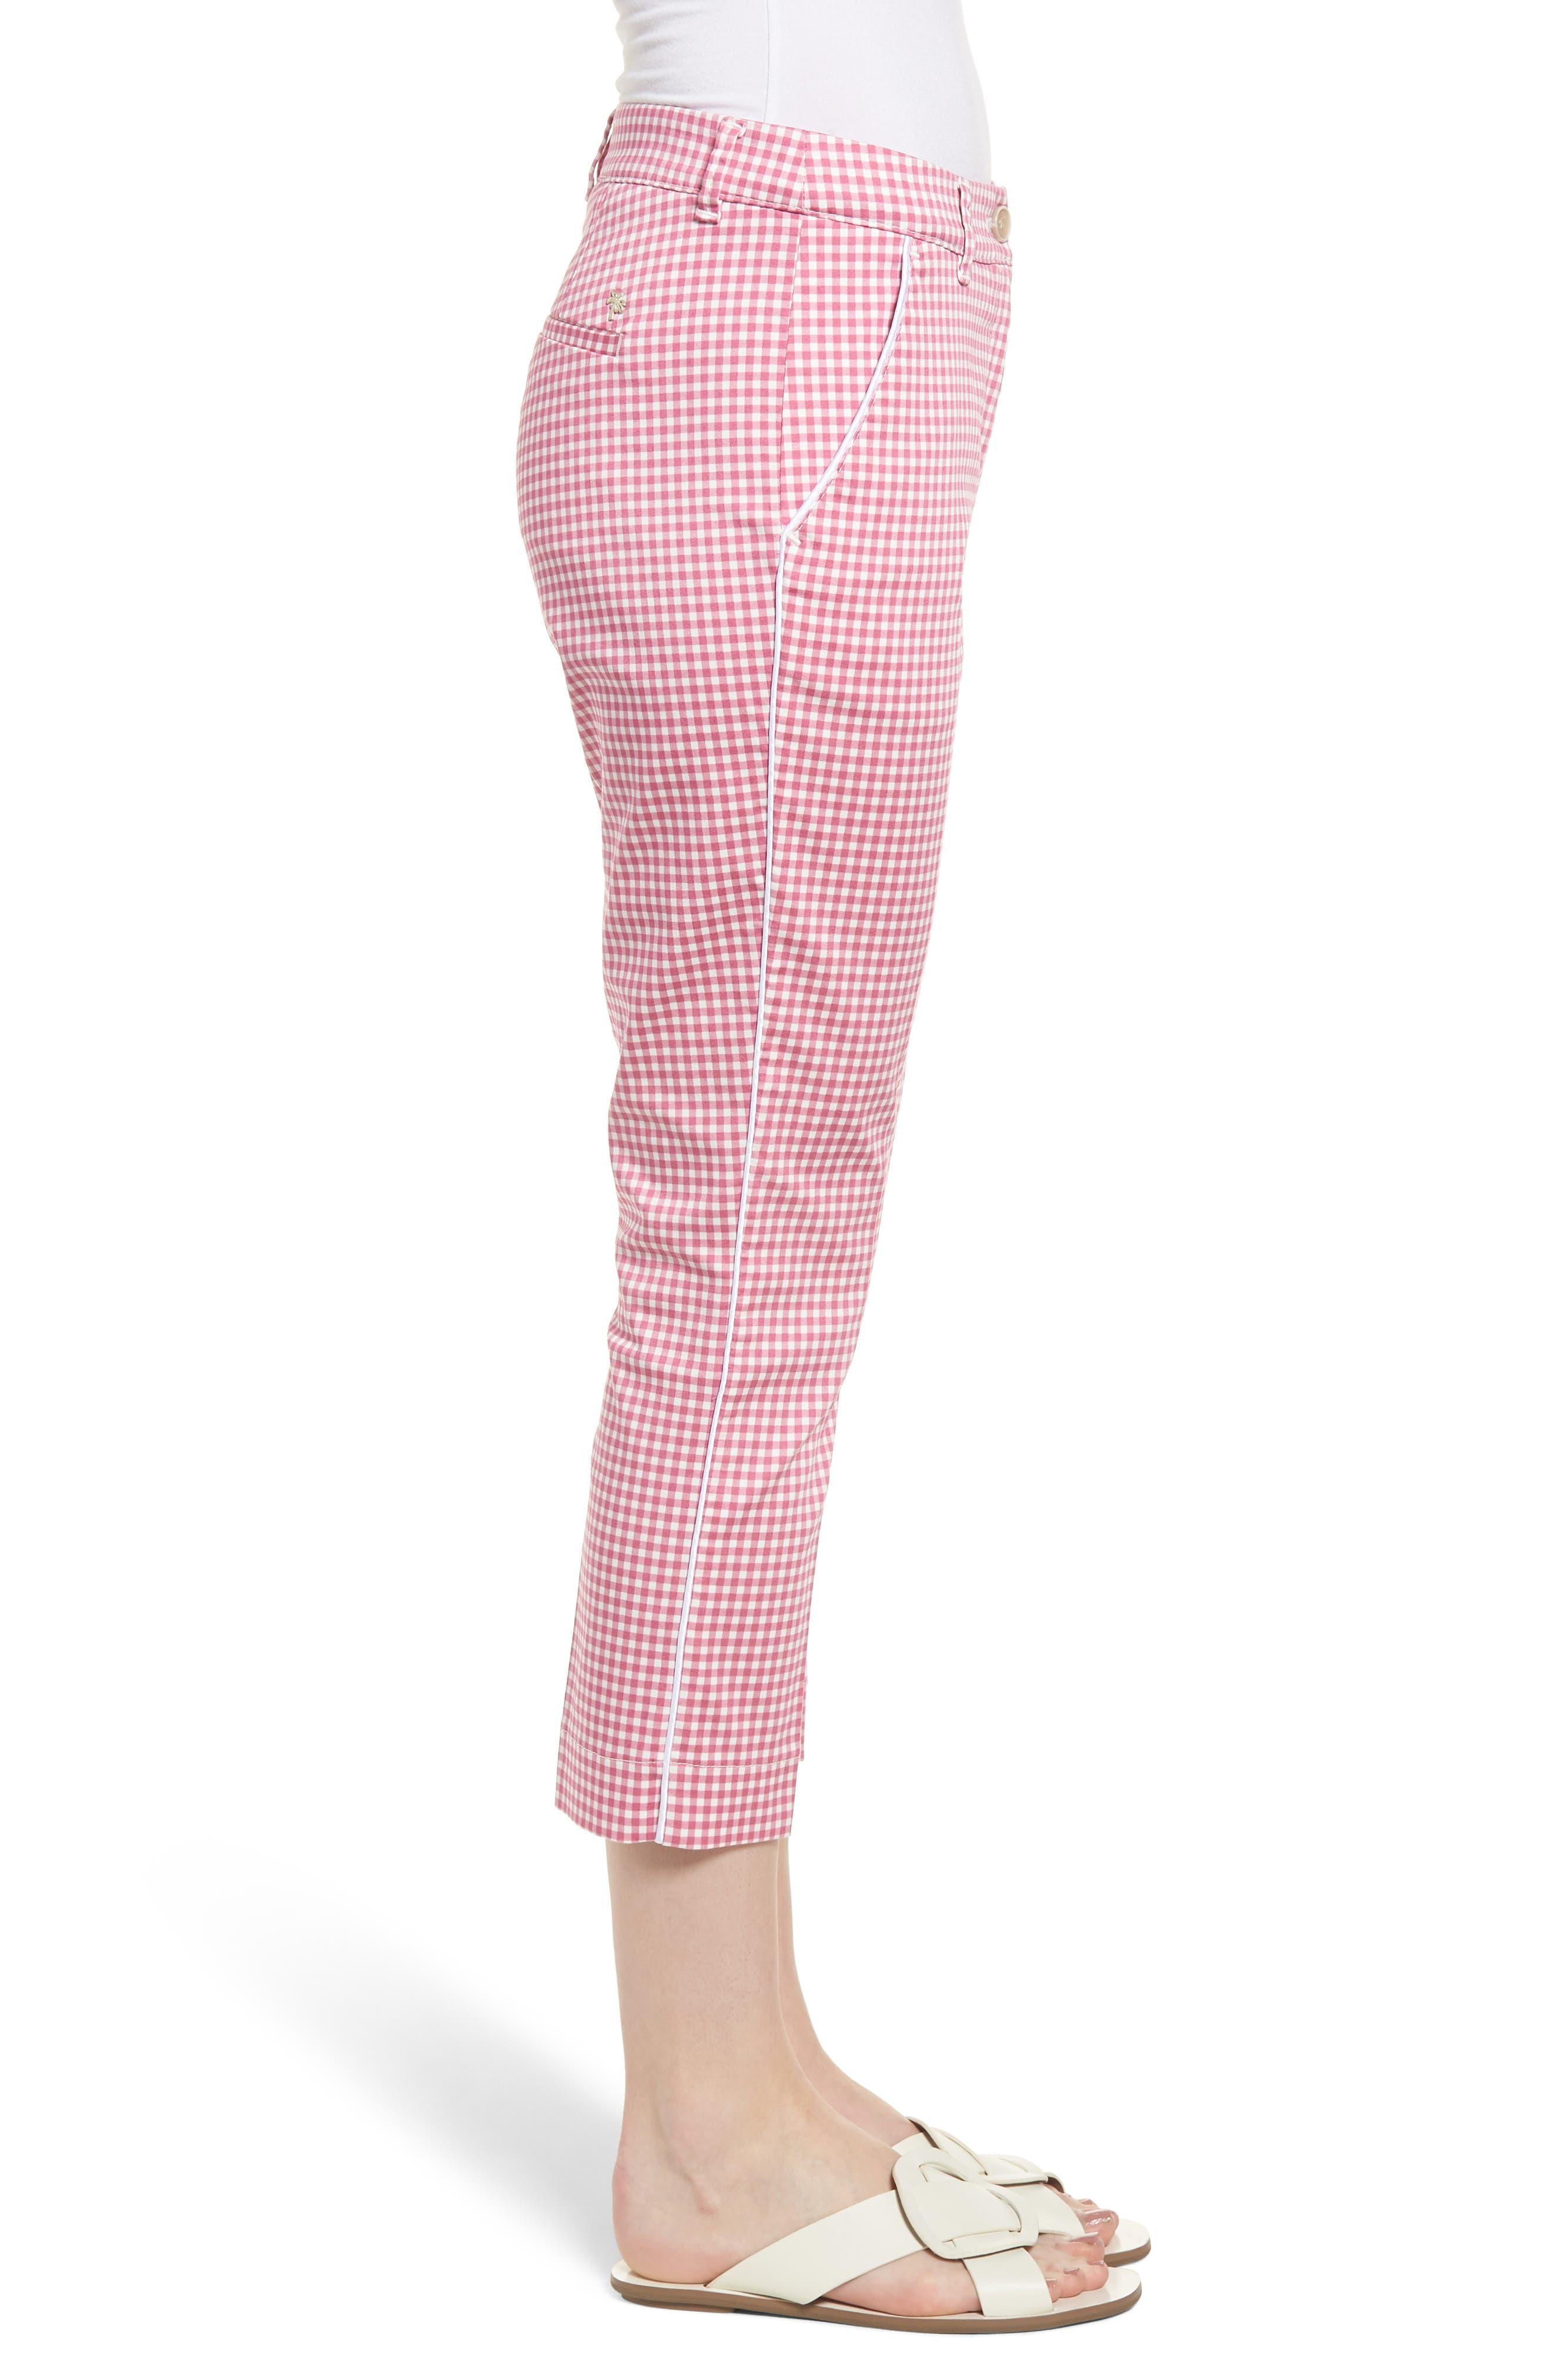 Maron Gingham Stretch Cotton Pants,                             Alternate thumbnail 3, color,                             Pink